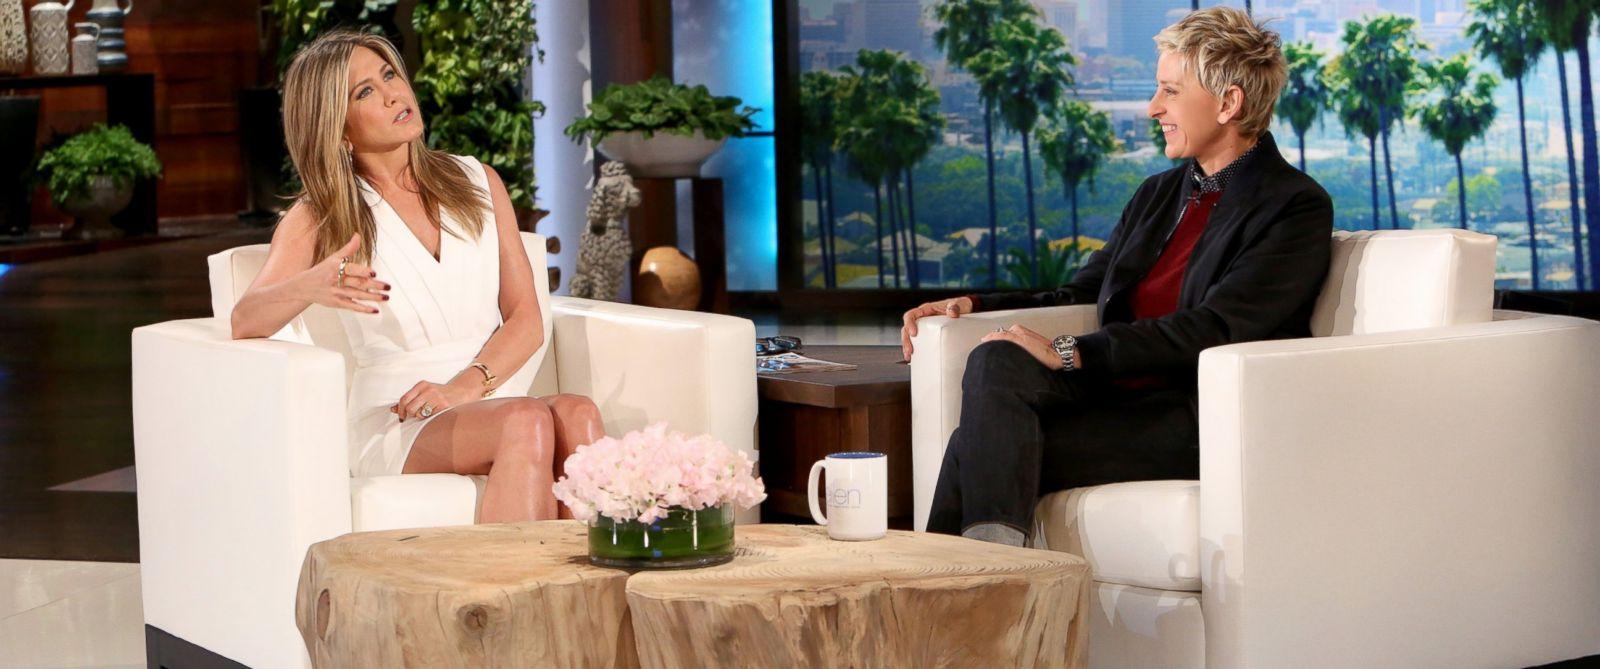 PHOTO: Jennifer Aniston talks with Ellen Degeneres on the Ellen show.